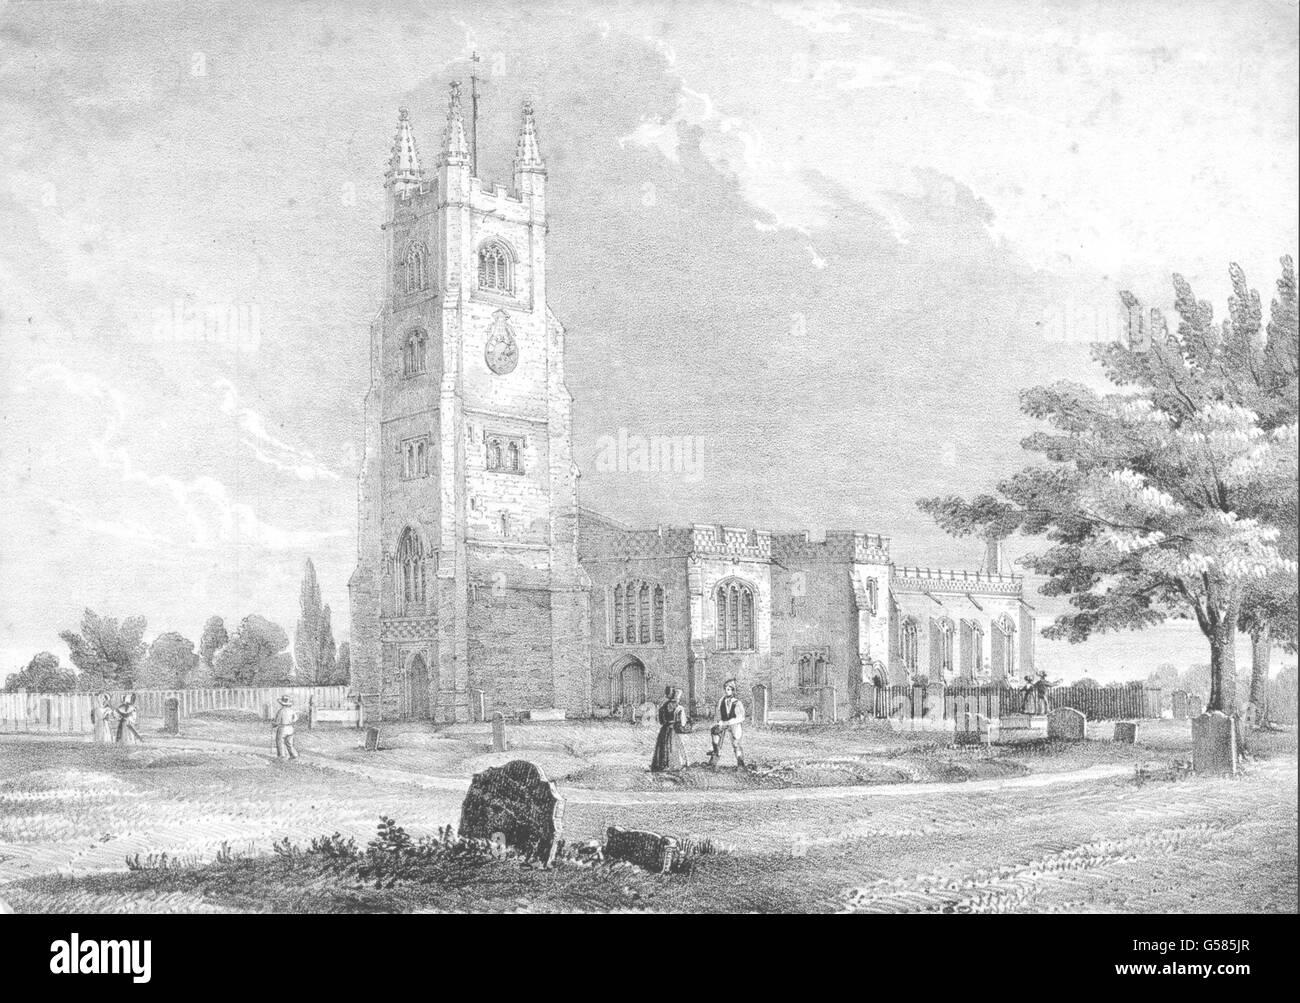 ESSEX: Prittlewell Church, Essex, antique print c1840 Stock Photo